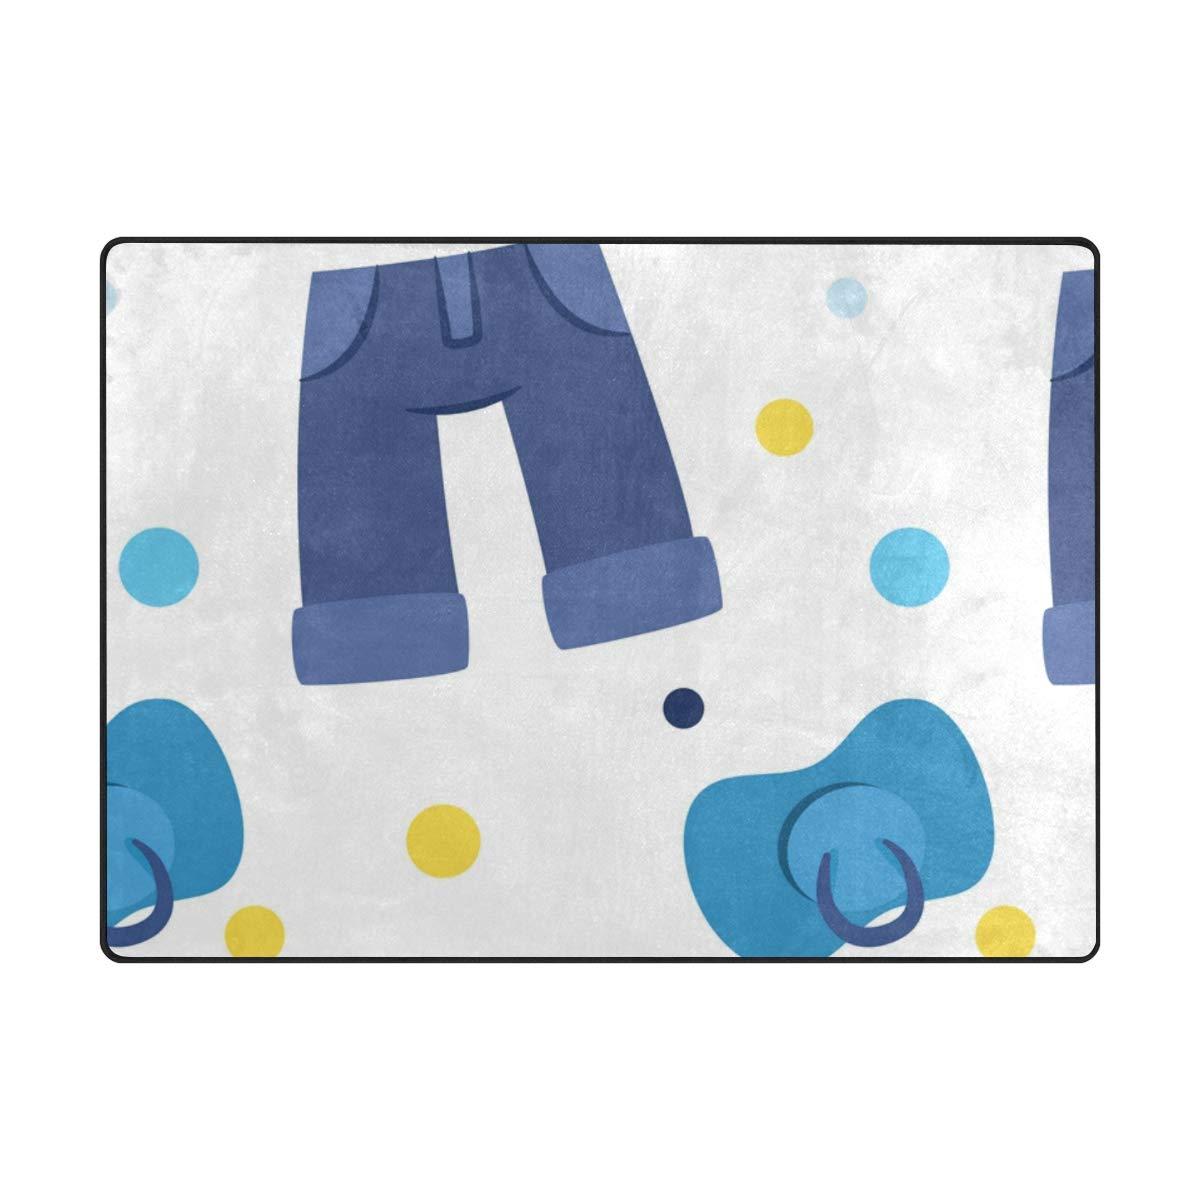 63 x 48 inch DEZIRO Baby Nipple and Pants Polyester Doormat Area Rug Carpet Entry Way Floor Mats shoes Scraper Home Dec Anti-Slip Washable